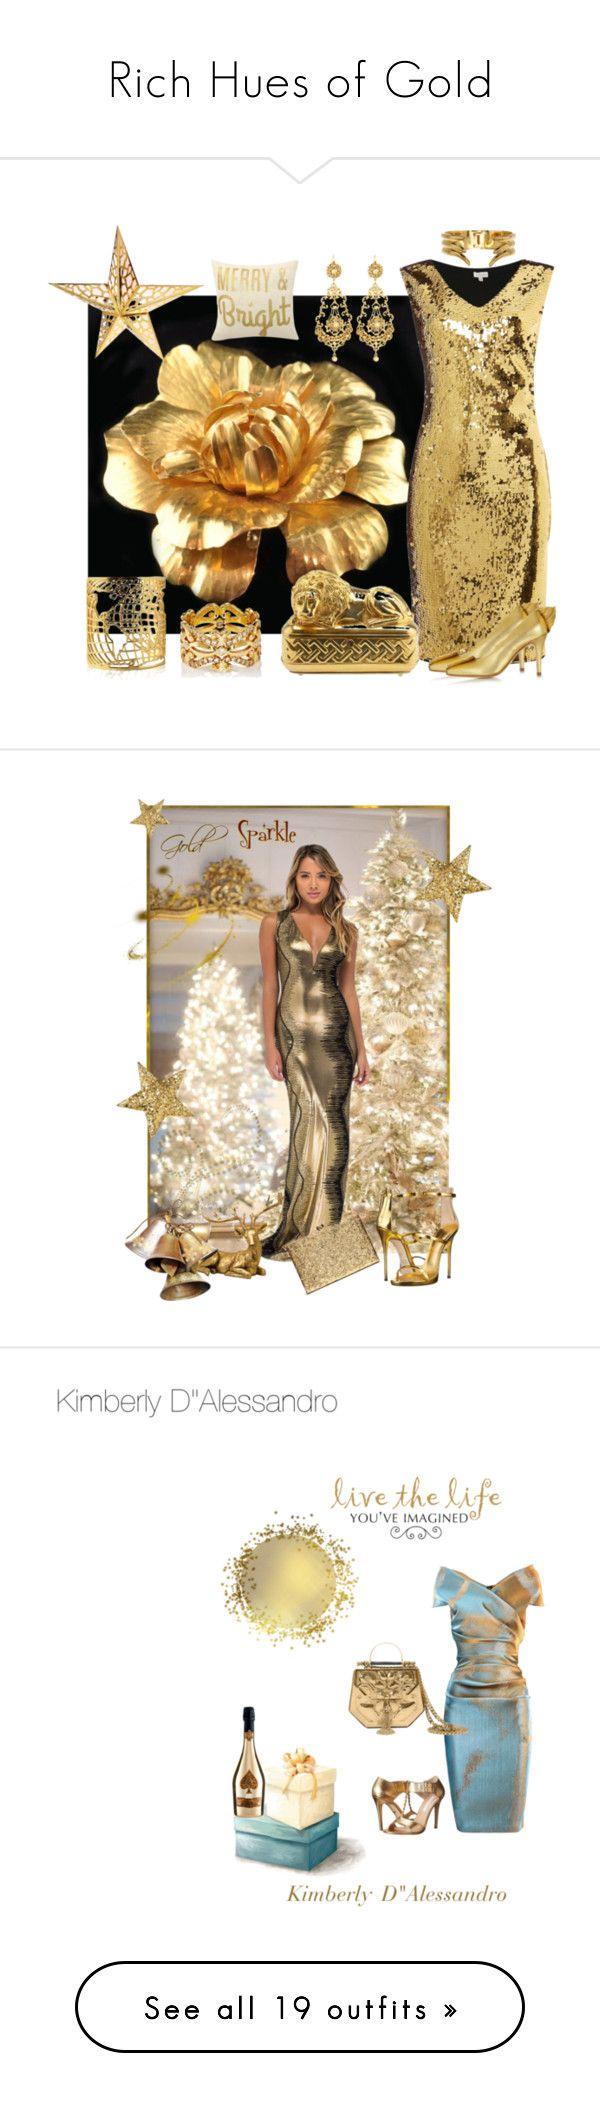 """Rich Hues of Gold"" by kimberlydalessandro ❤ liked on Polyvore featuring Untold, Jose & Maria Barrera, Sara Weinstock, Judith Leiber, Zoe Lee, Botkier, danceparty, Giuseppe Zanotti, Talbot Runhof and WALL"